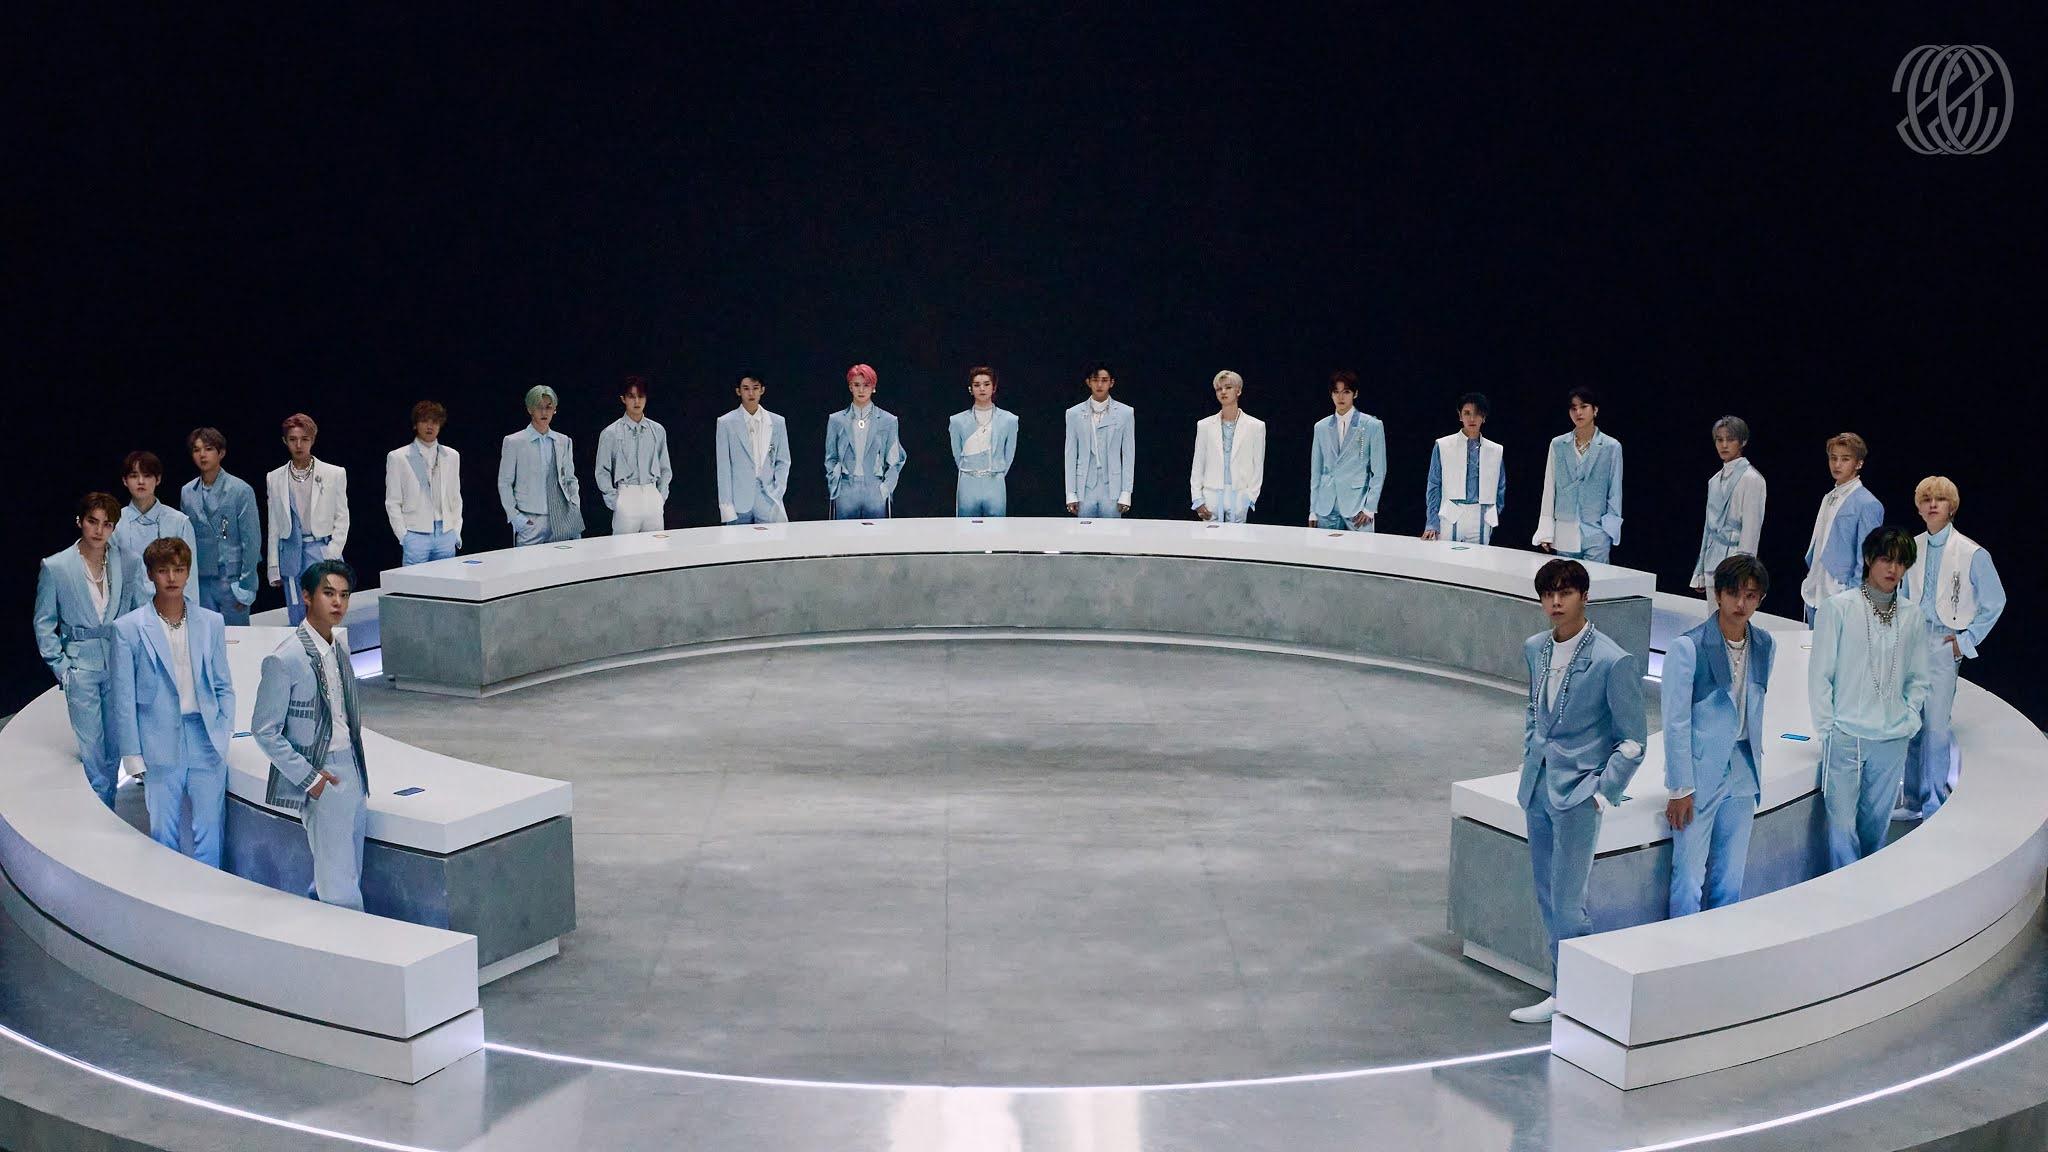 NCT 2020's Album 'RESONANCE Pt. 1' Reaches 1.1 Million Pre-orders